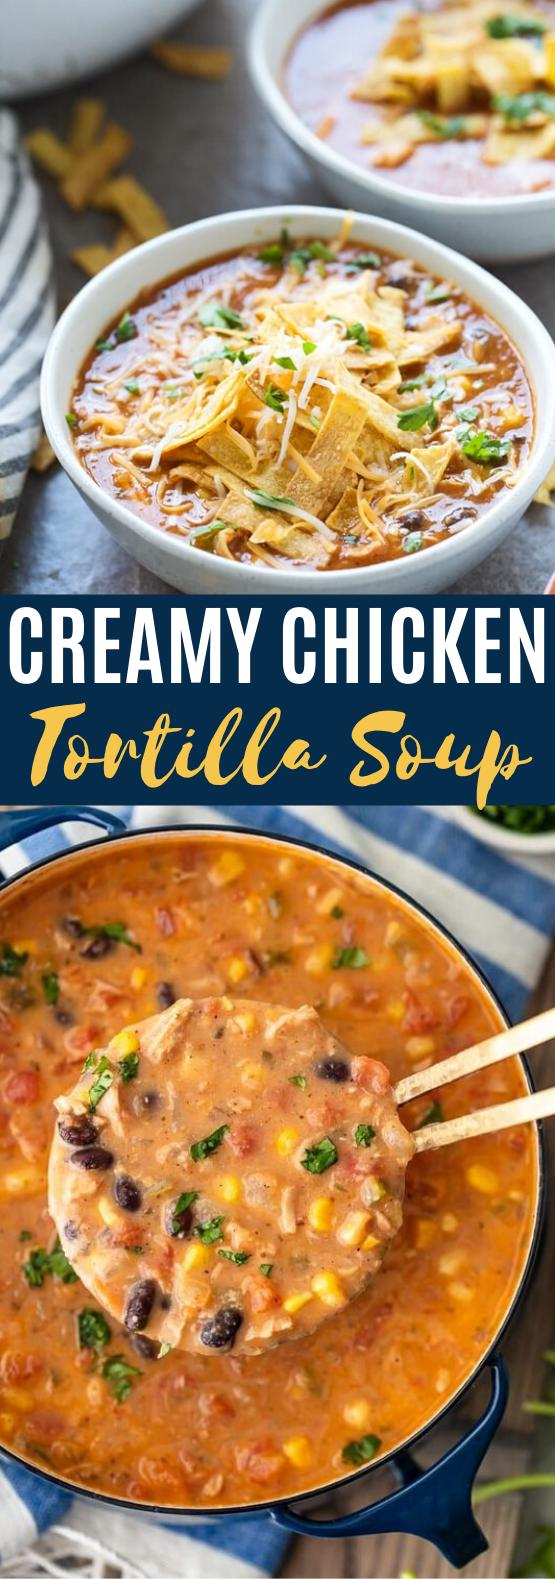 Creamy Chicken Tortilla Soup #dinner #recipes #soup #comfortfood #weeknight